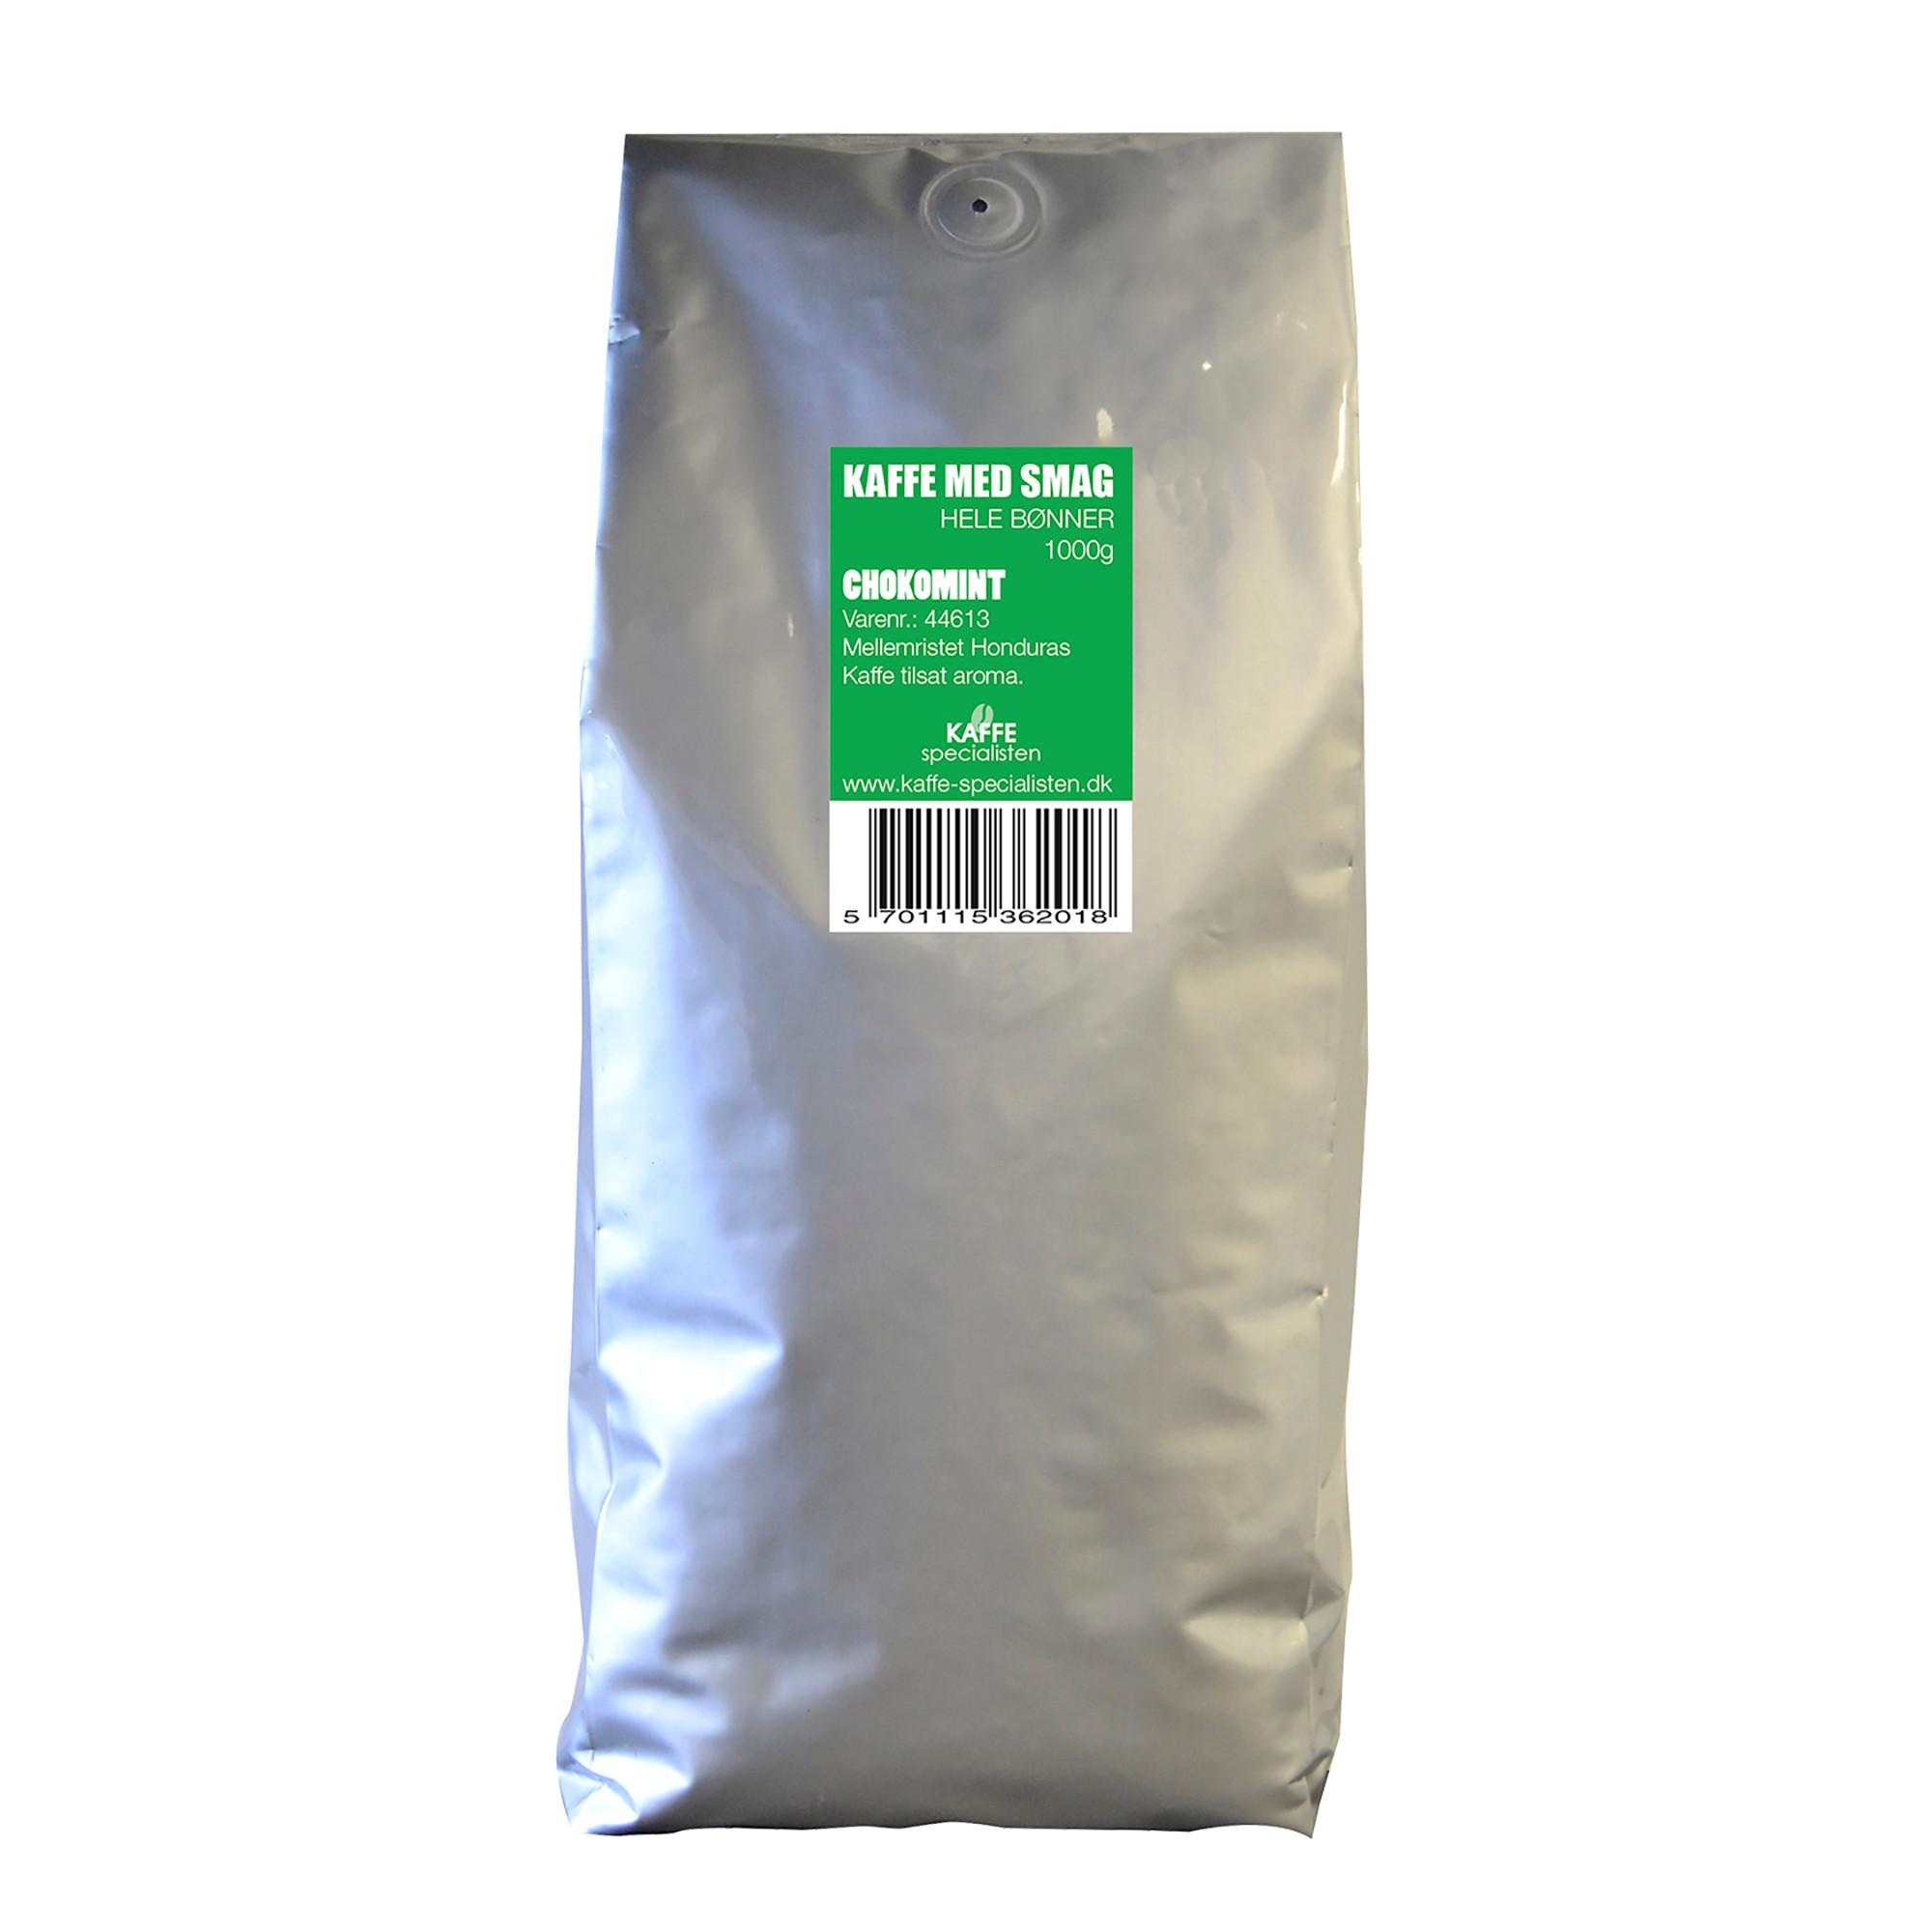 KAFFE Specialisten Kaffebønner Choko Mint Smag